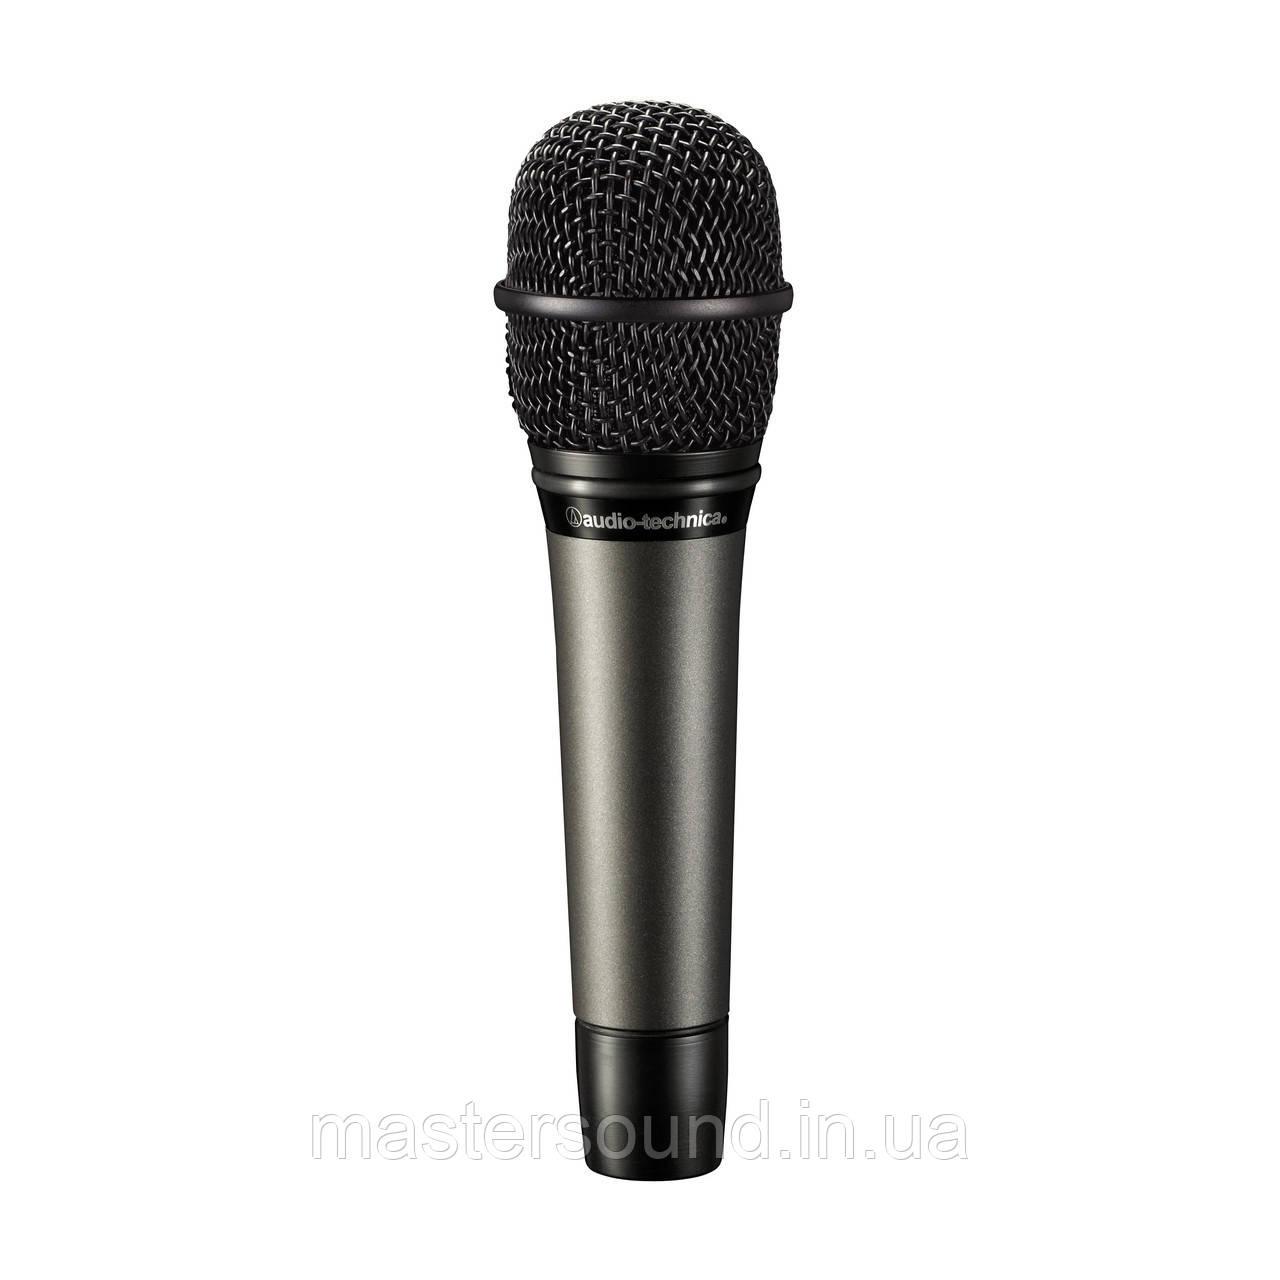 Микрофон Audio-Technica ATM610A